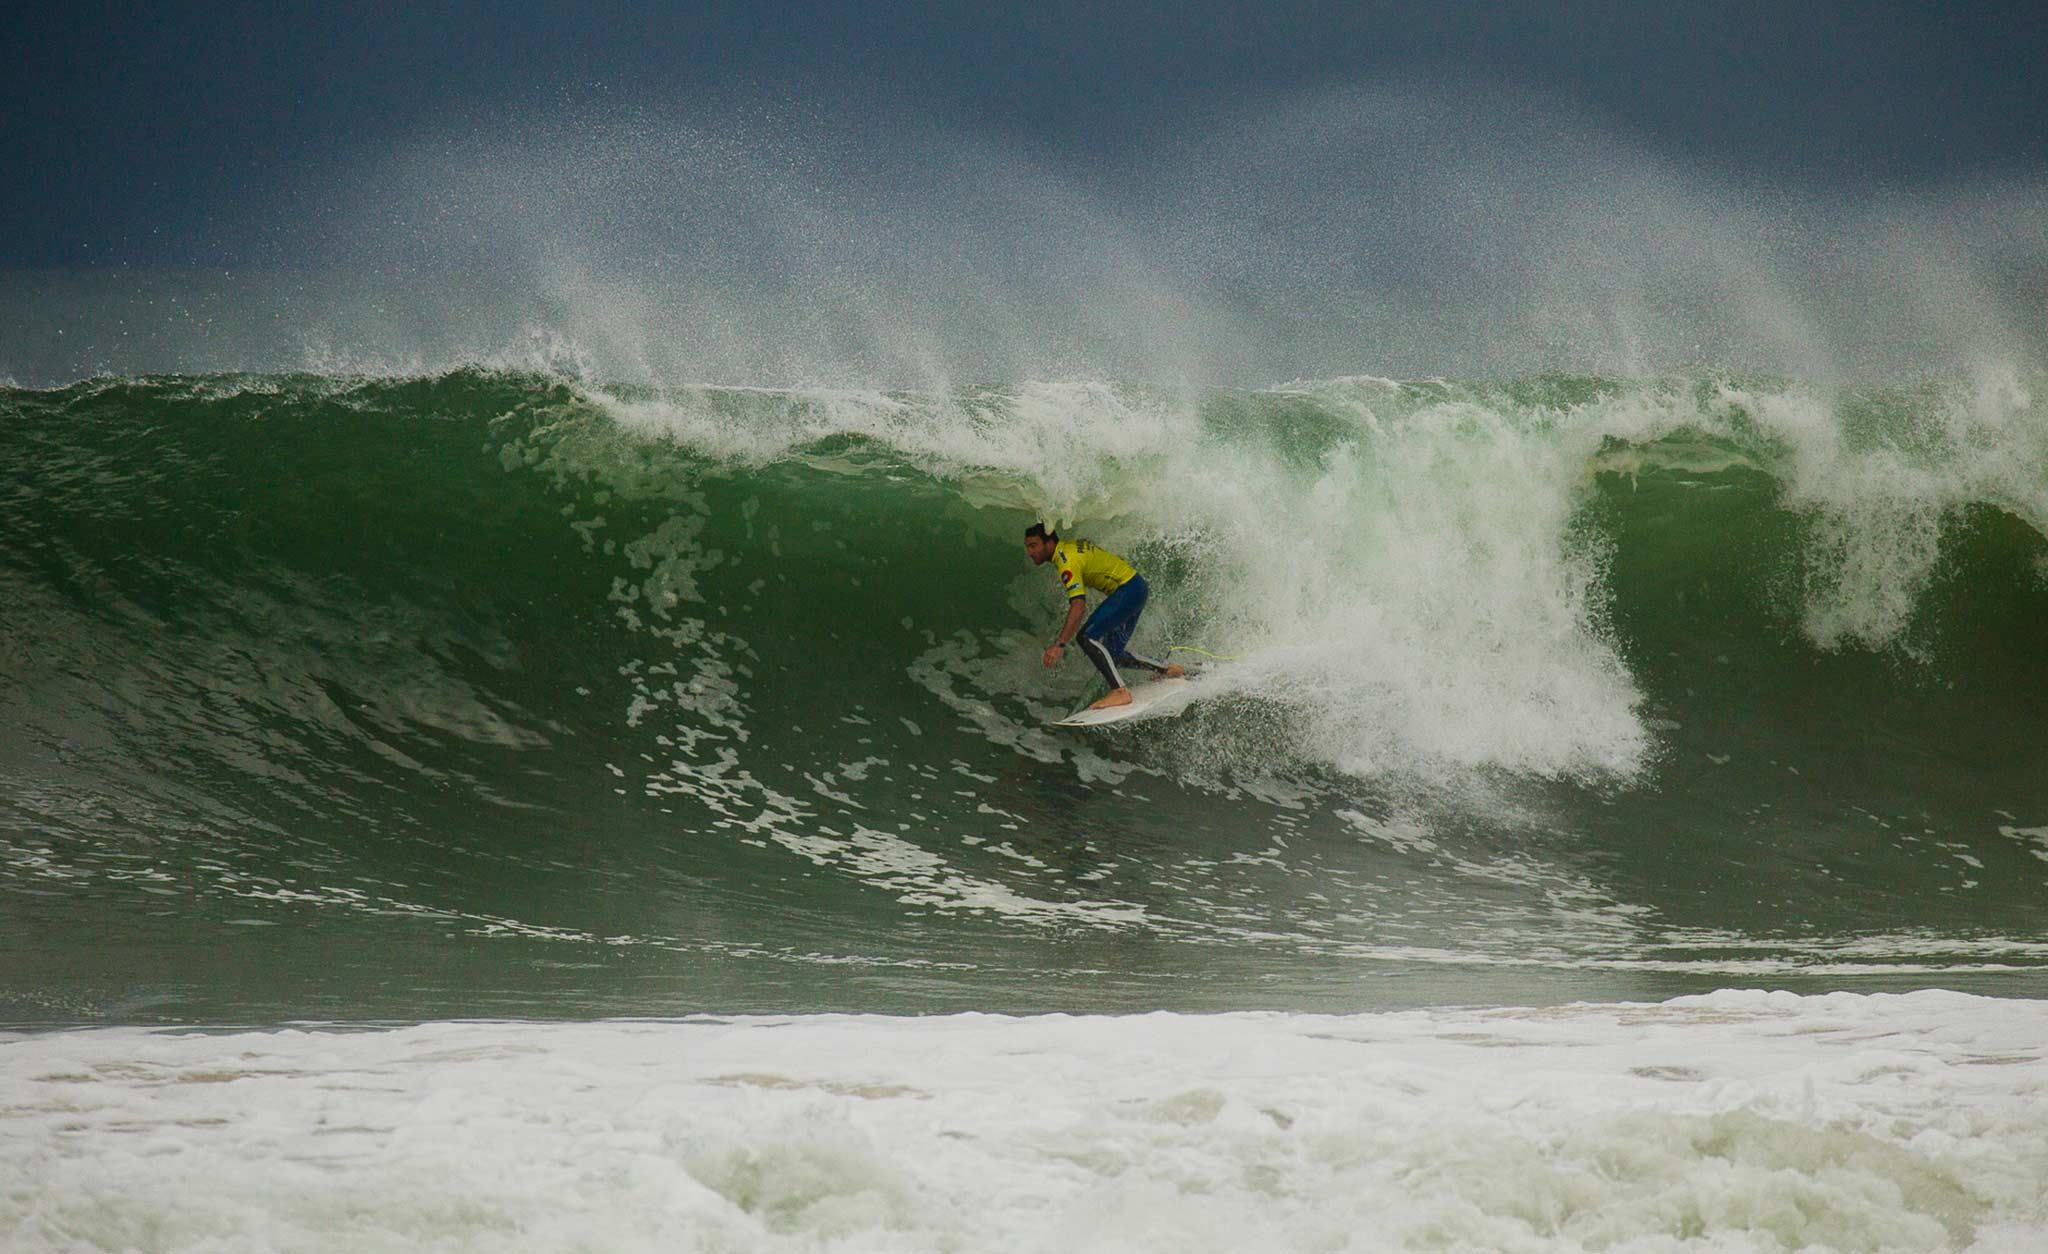 Joel Parkinson, Rip Curl Pro Portugal